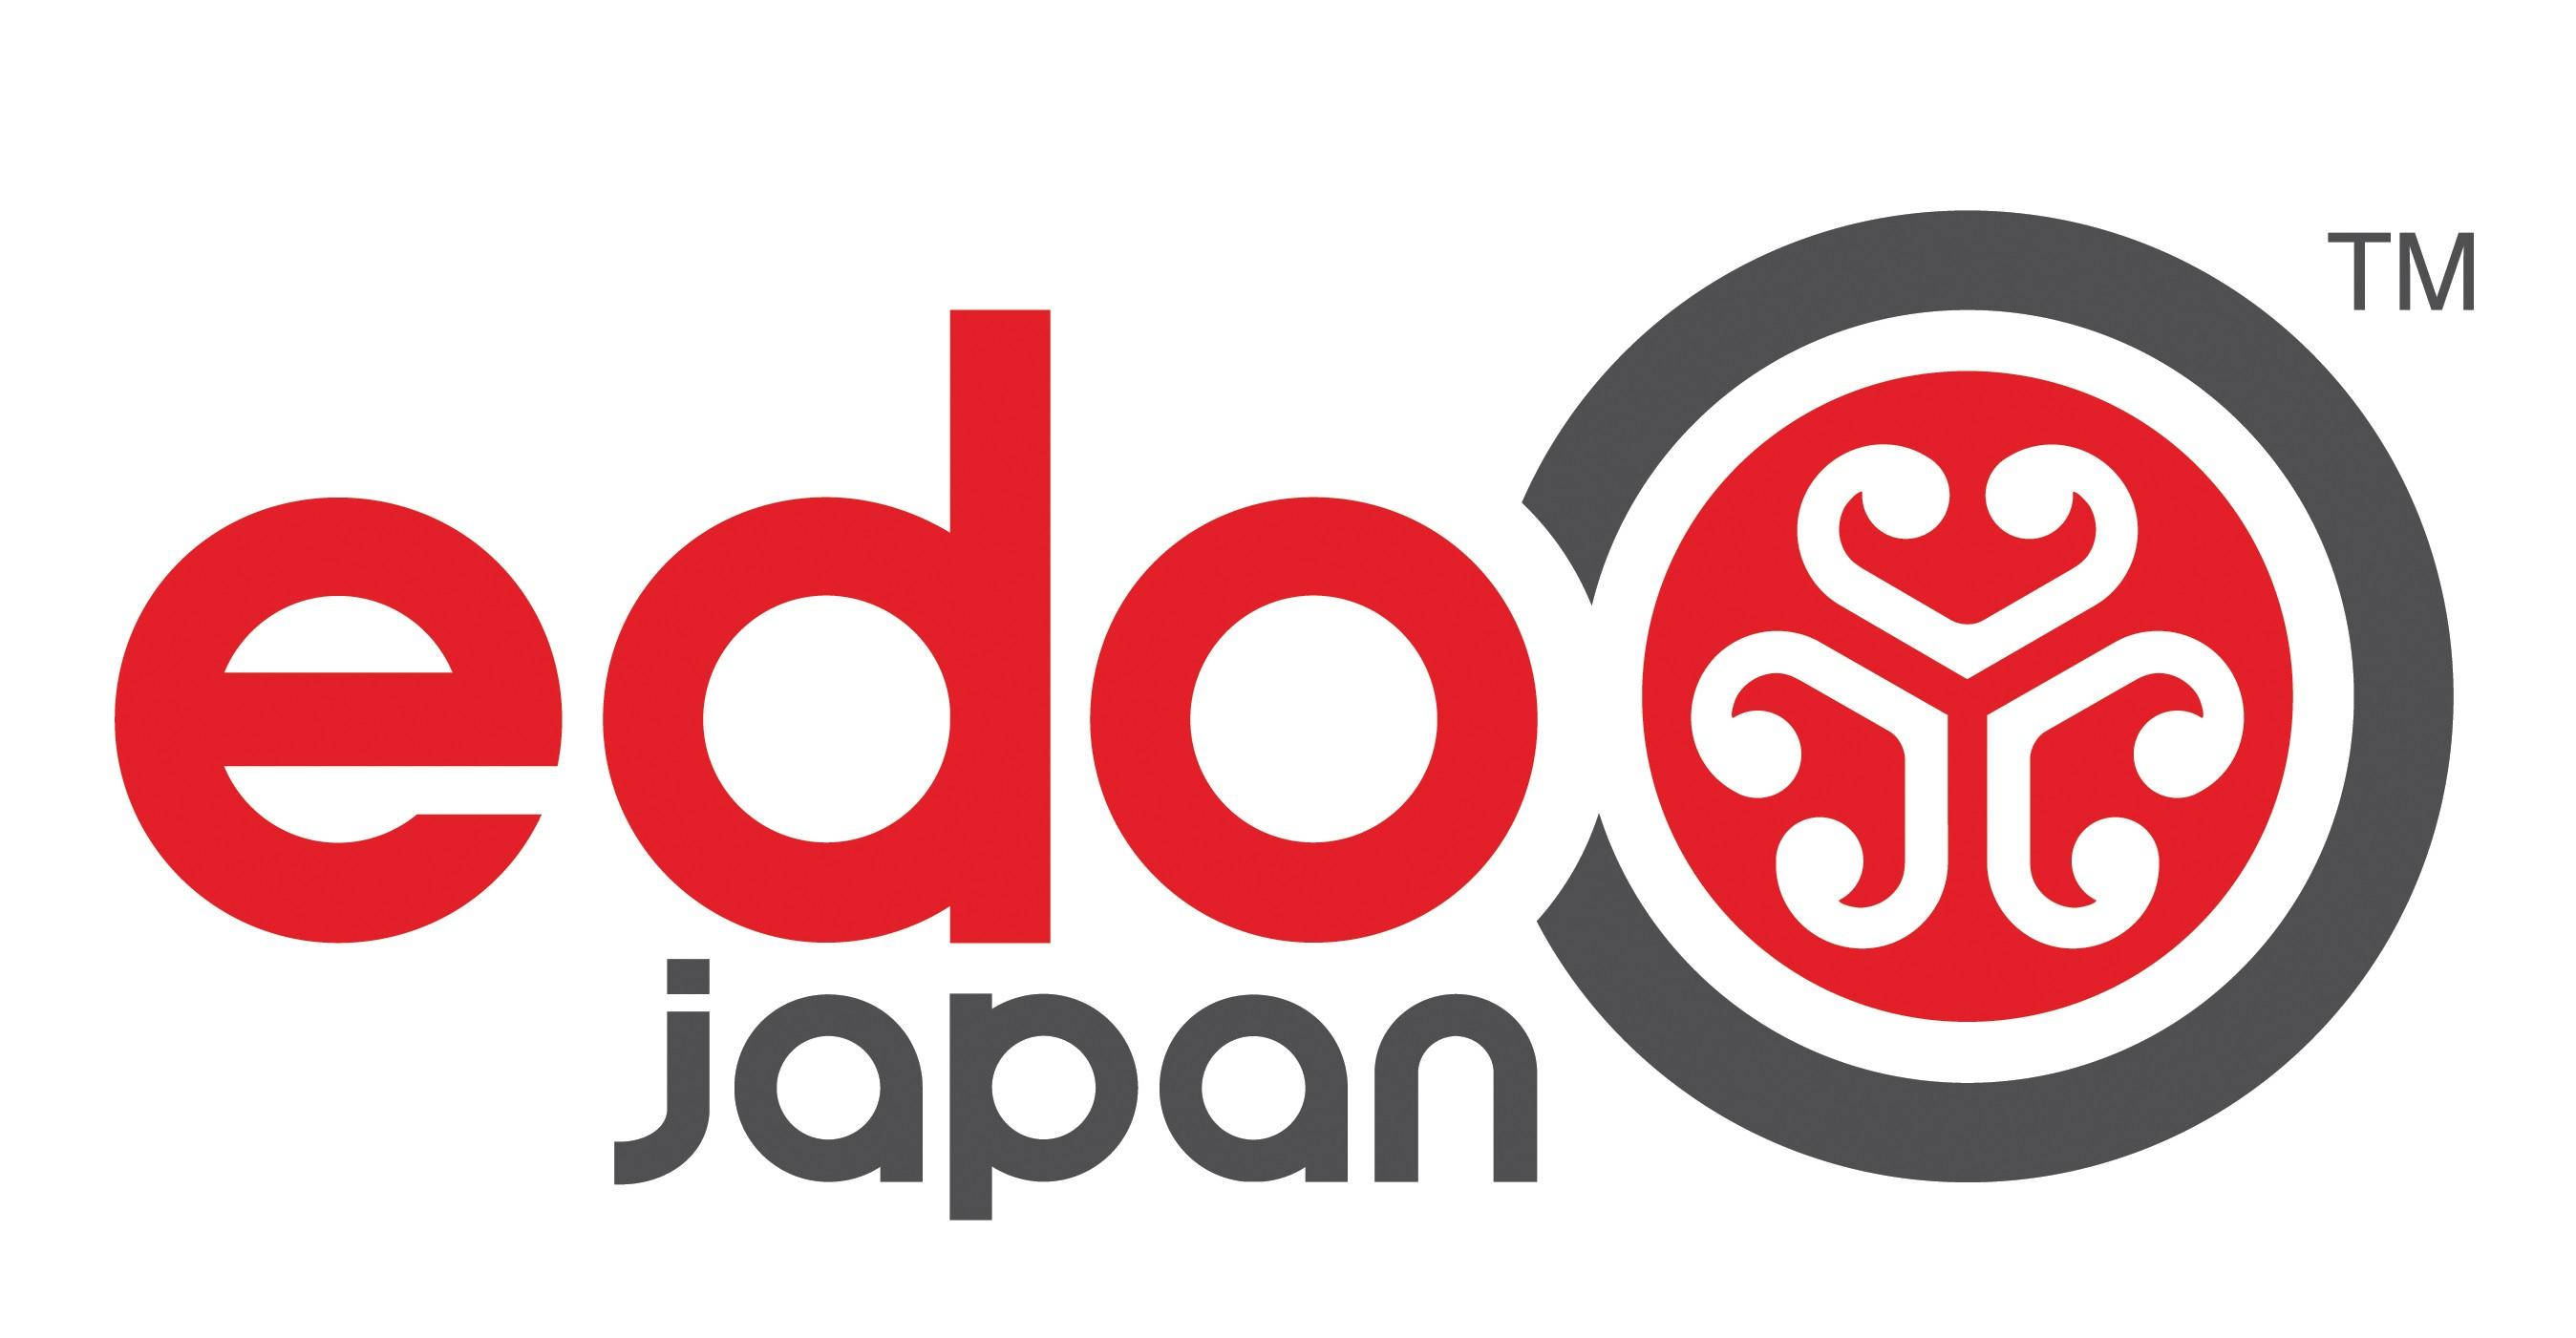 Edo Japan Expands Market Presence With Signature Teriyaki Sauce by the Bottle